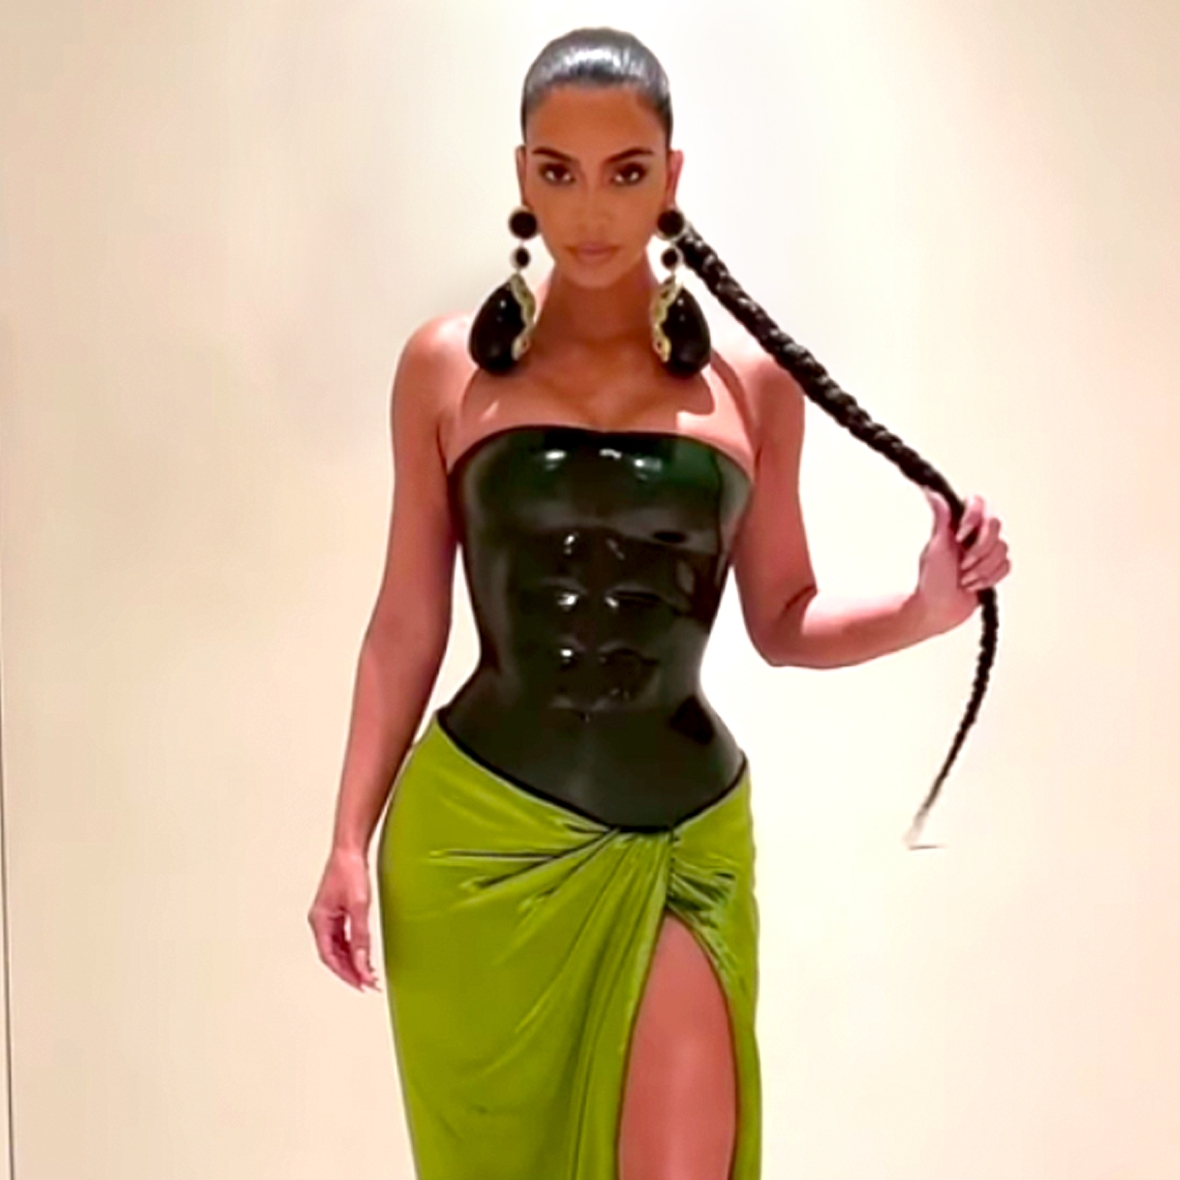 Fans Totally Roast Kim Kardashian's Green Christmas Look: 'She the Hulk'